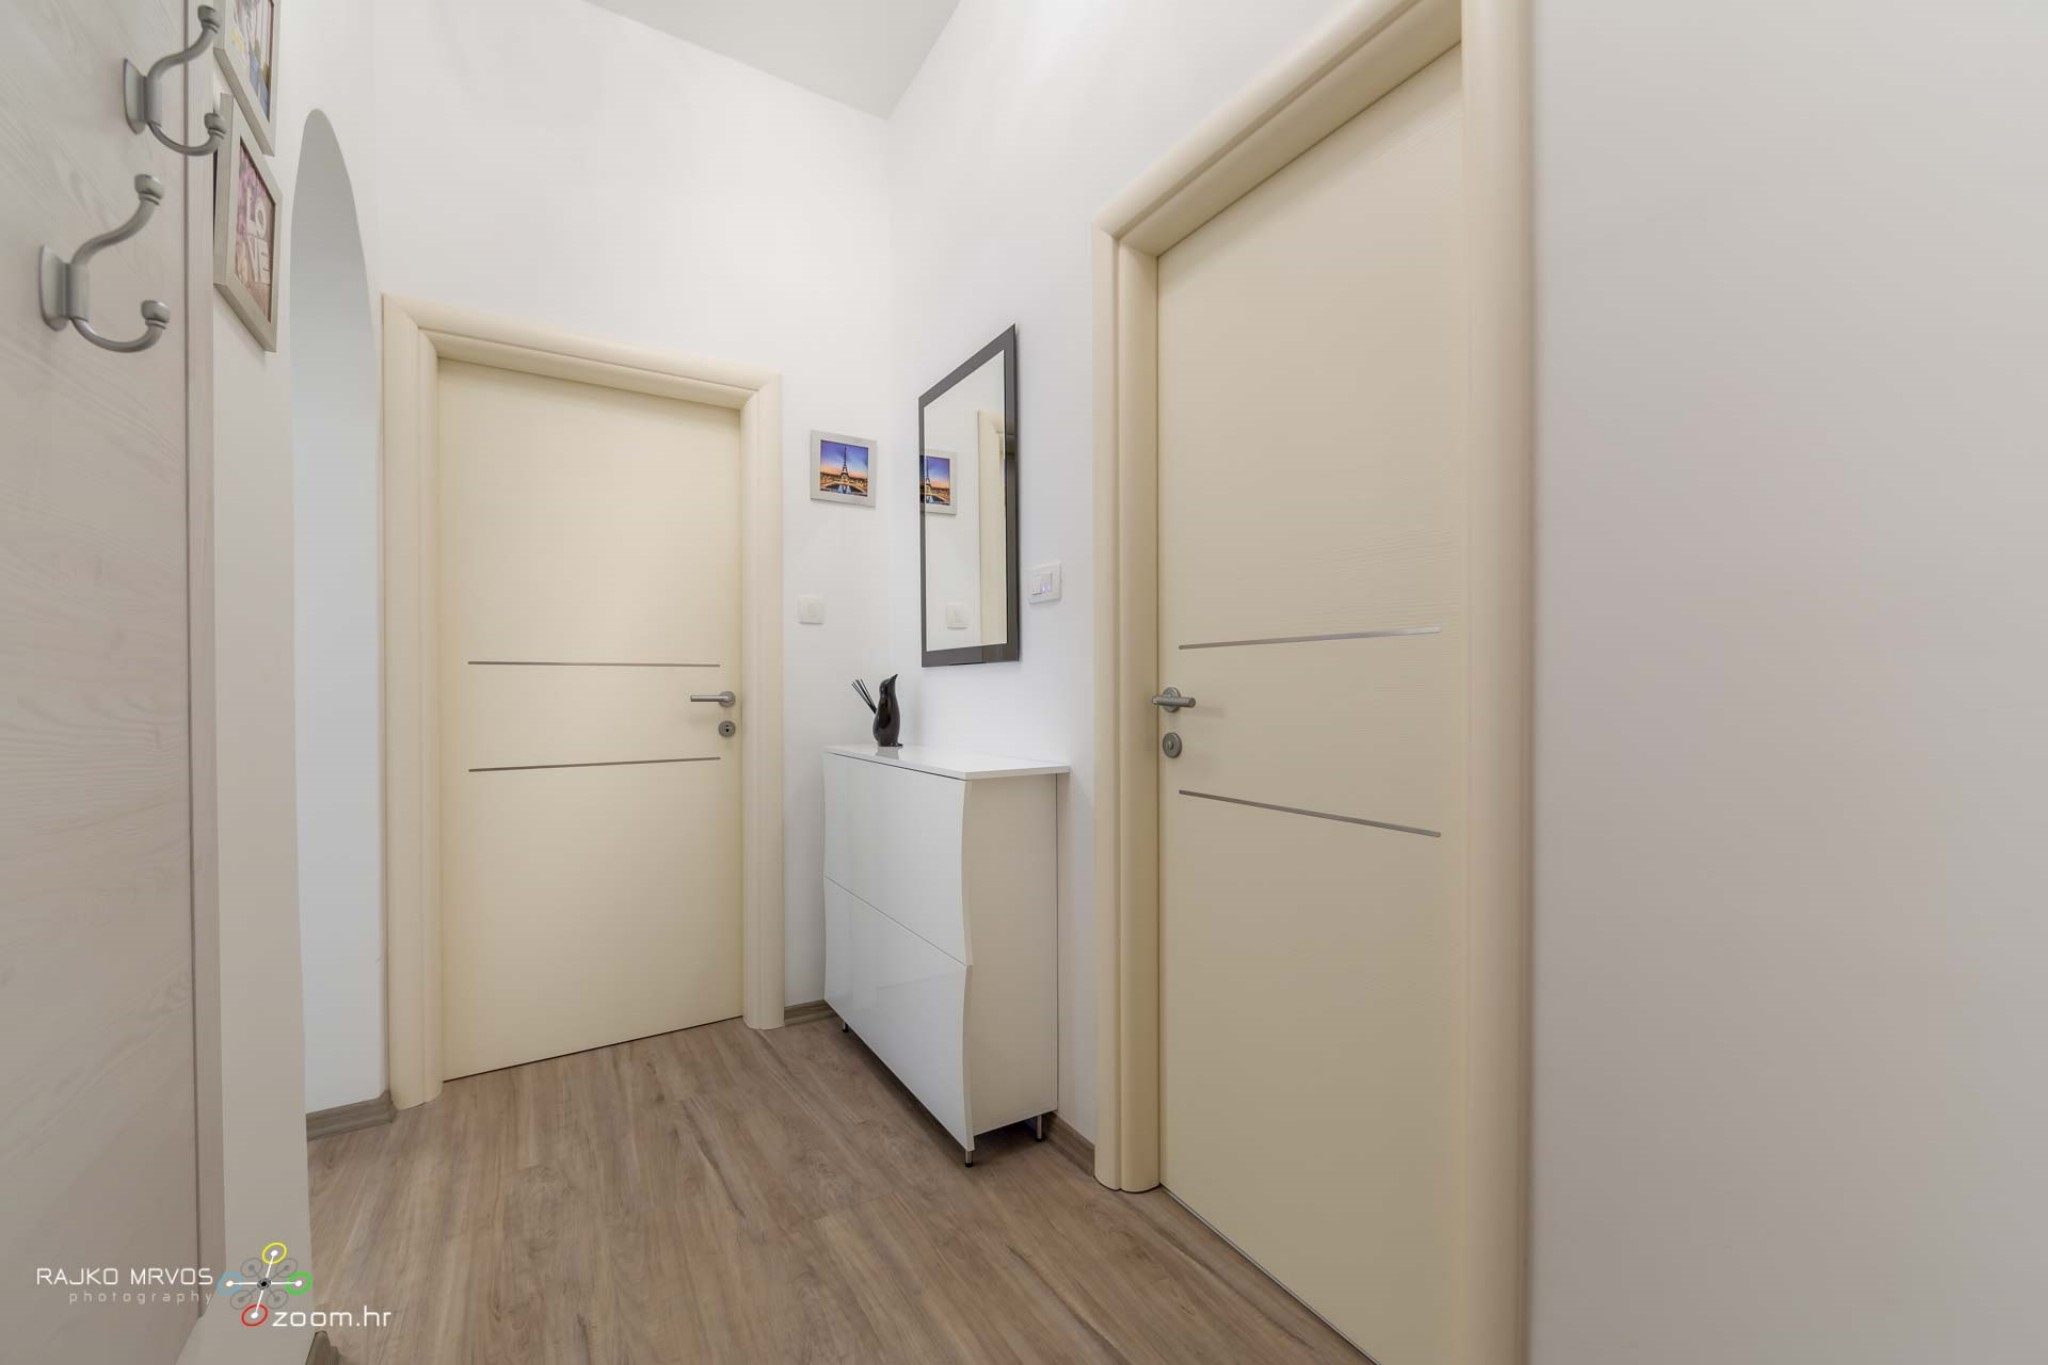 fotografiranje-interijera-fotograf-eksterijera-vila-apartmana-kuca-apartmani-Dujmic-4